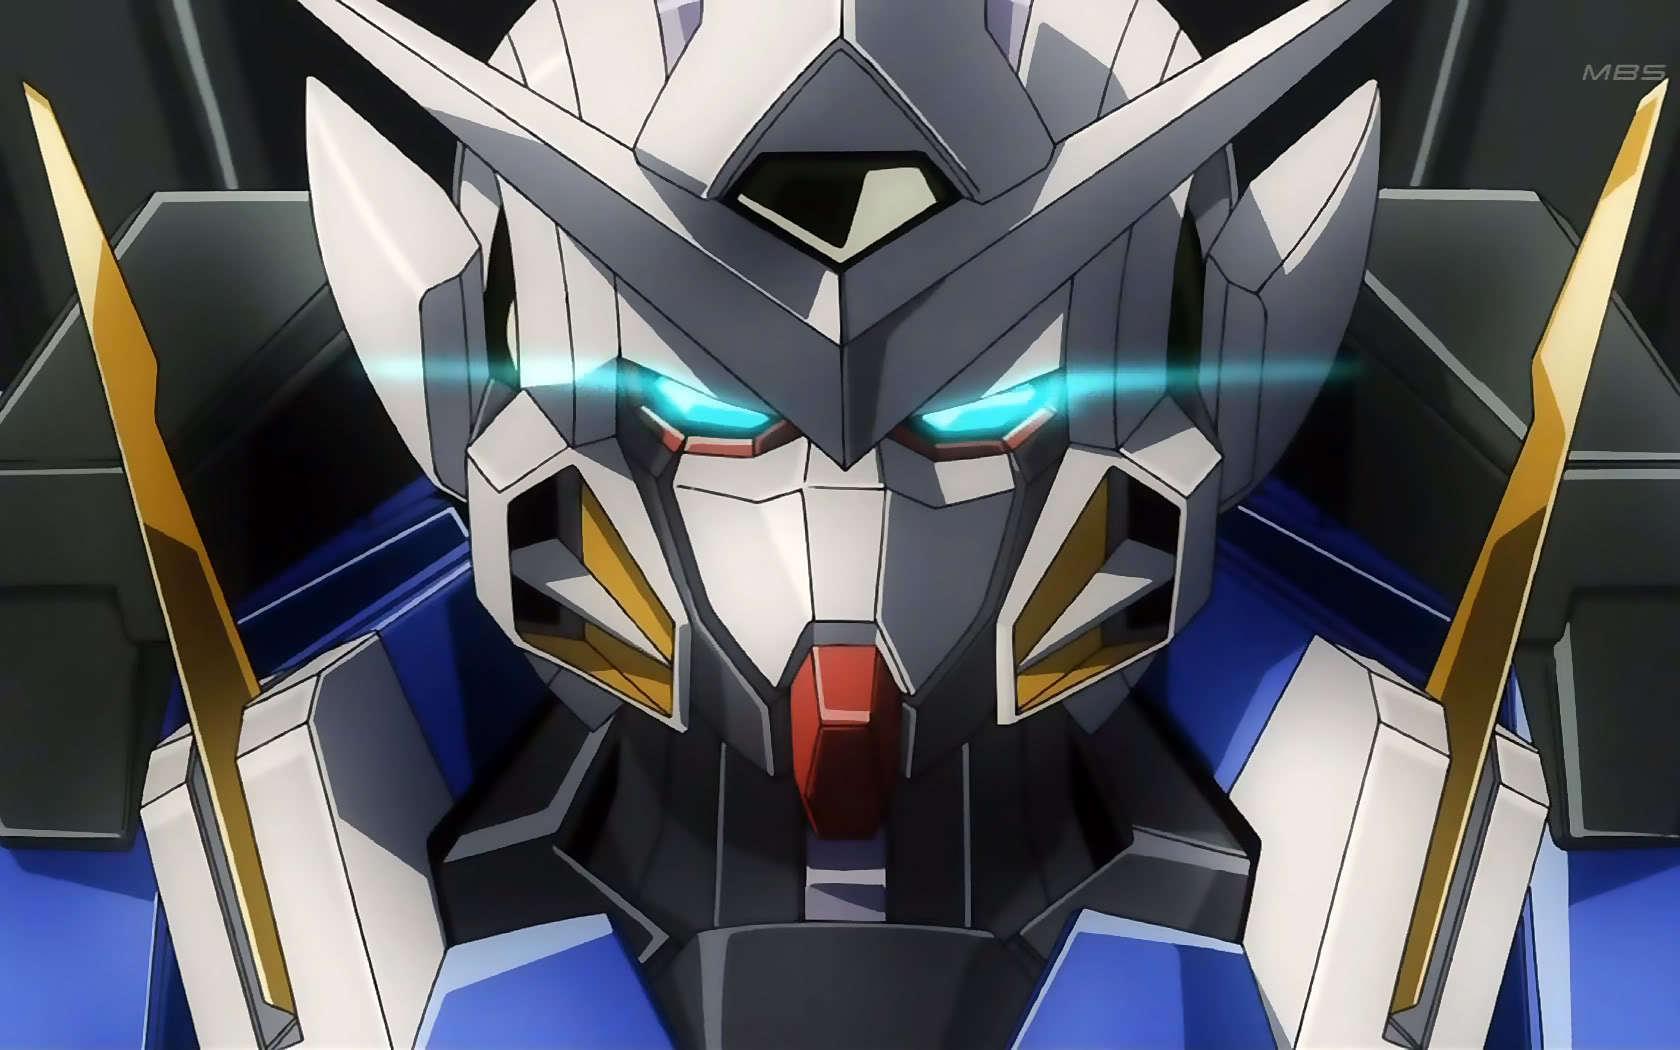 mobile suit gundam 00 images Gundam 00 wallpaper photos 20740668 1680x1050